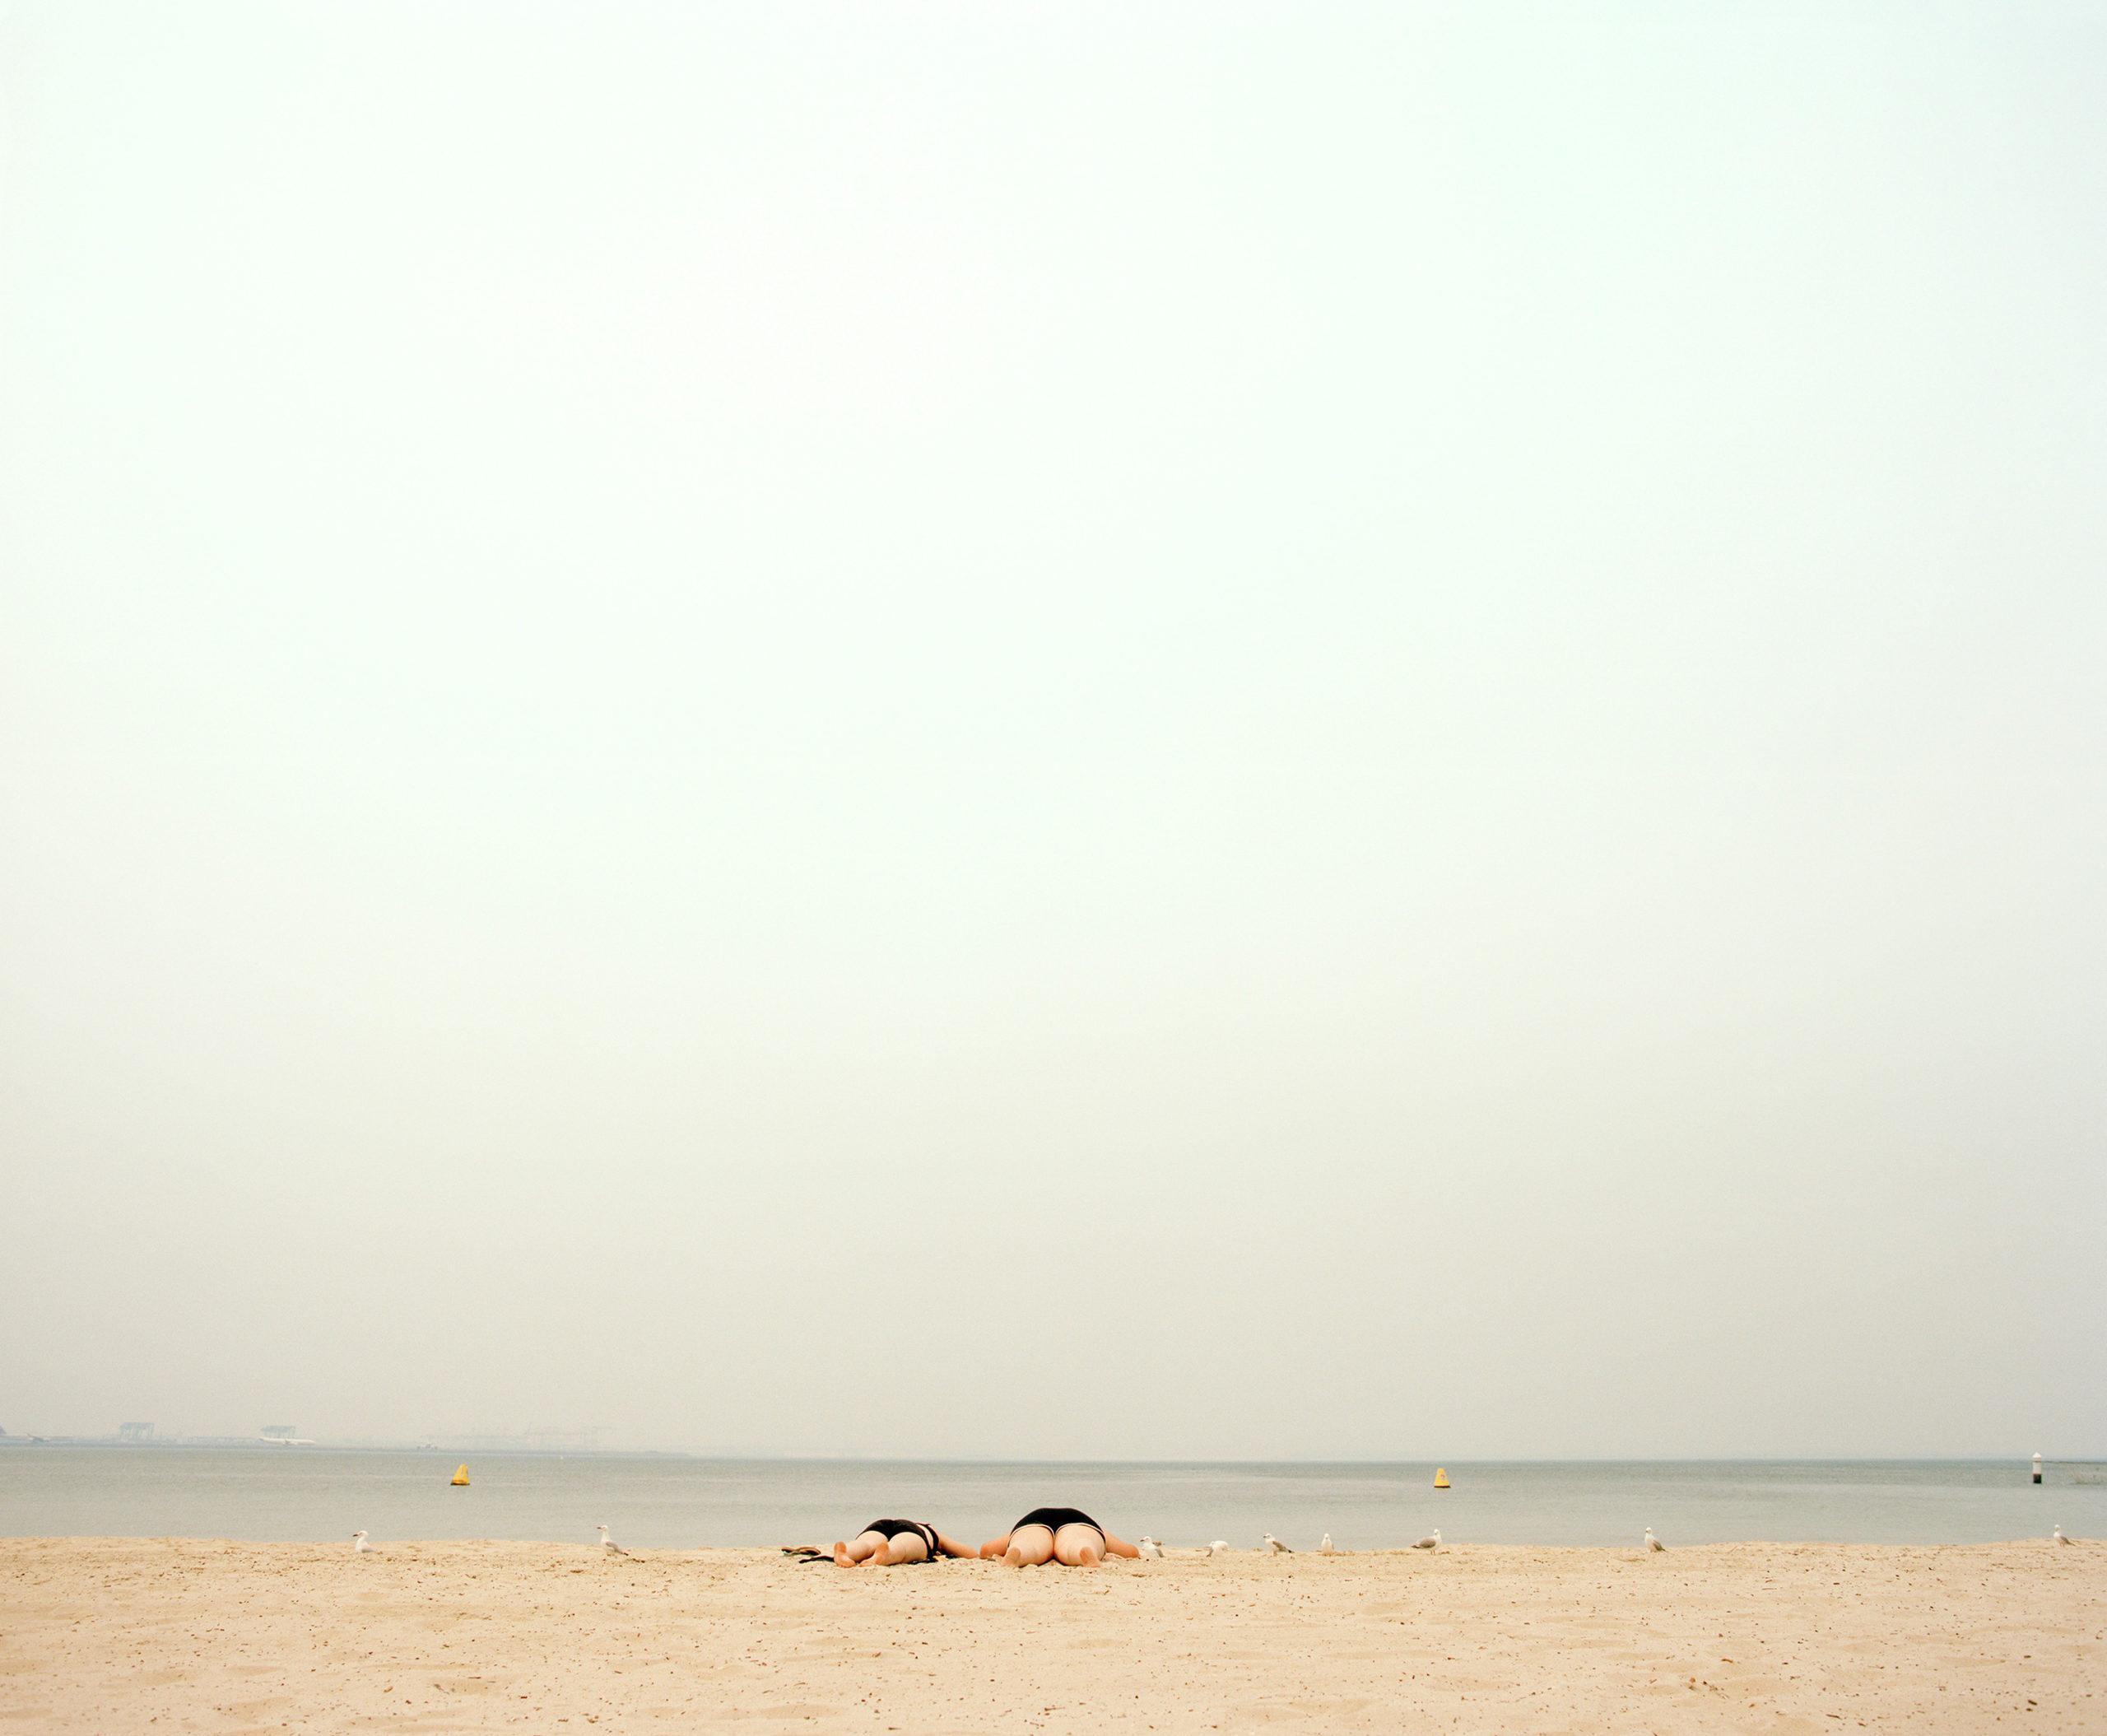 Legs - Concrete Collection - Fine Art Photography by Toby Dixon